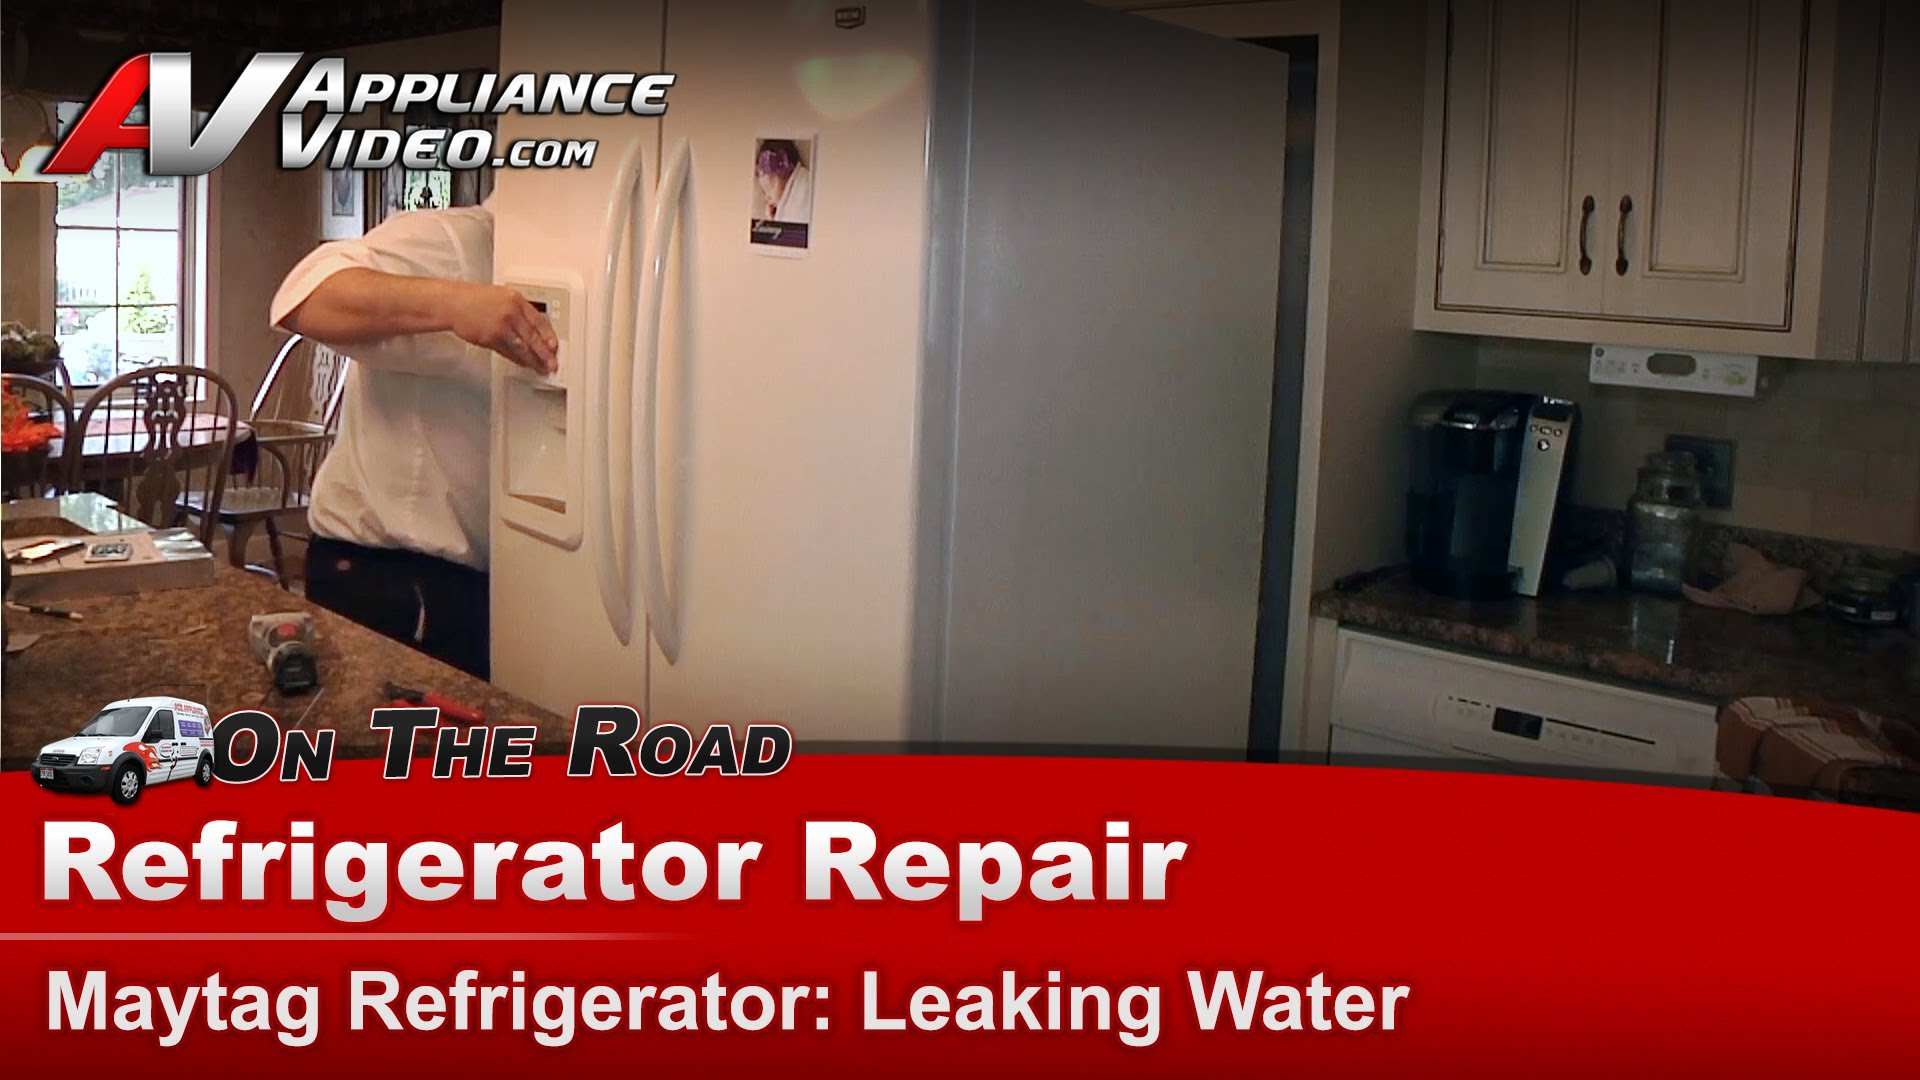 Home Appliance Technician